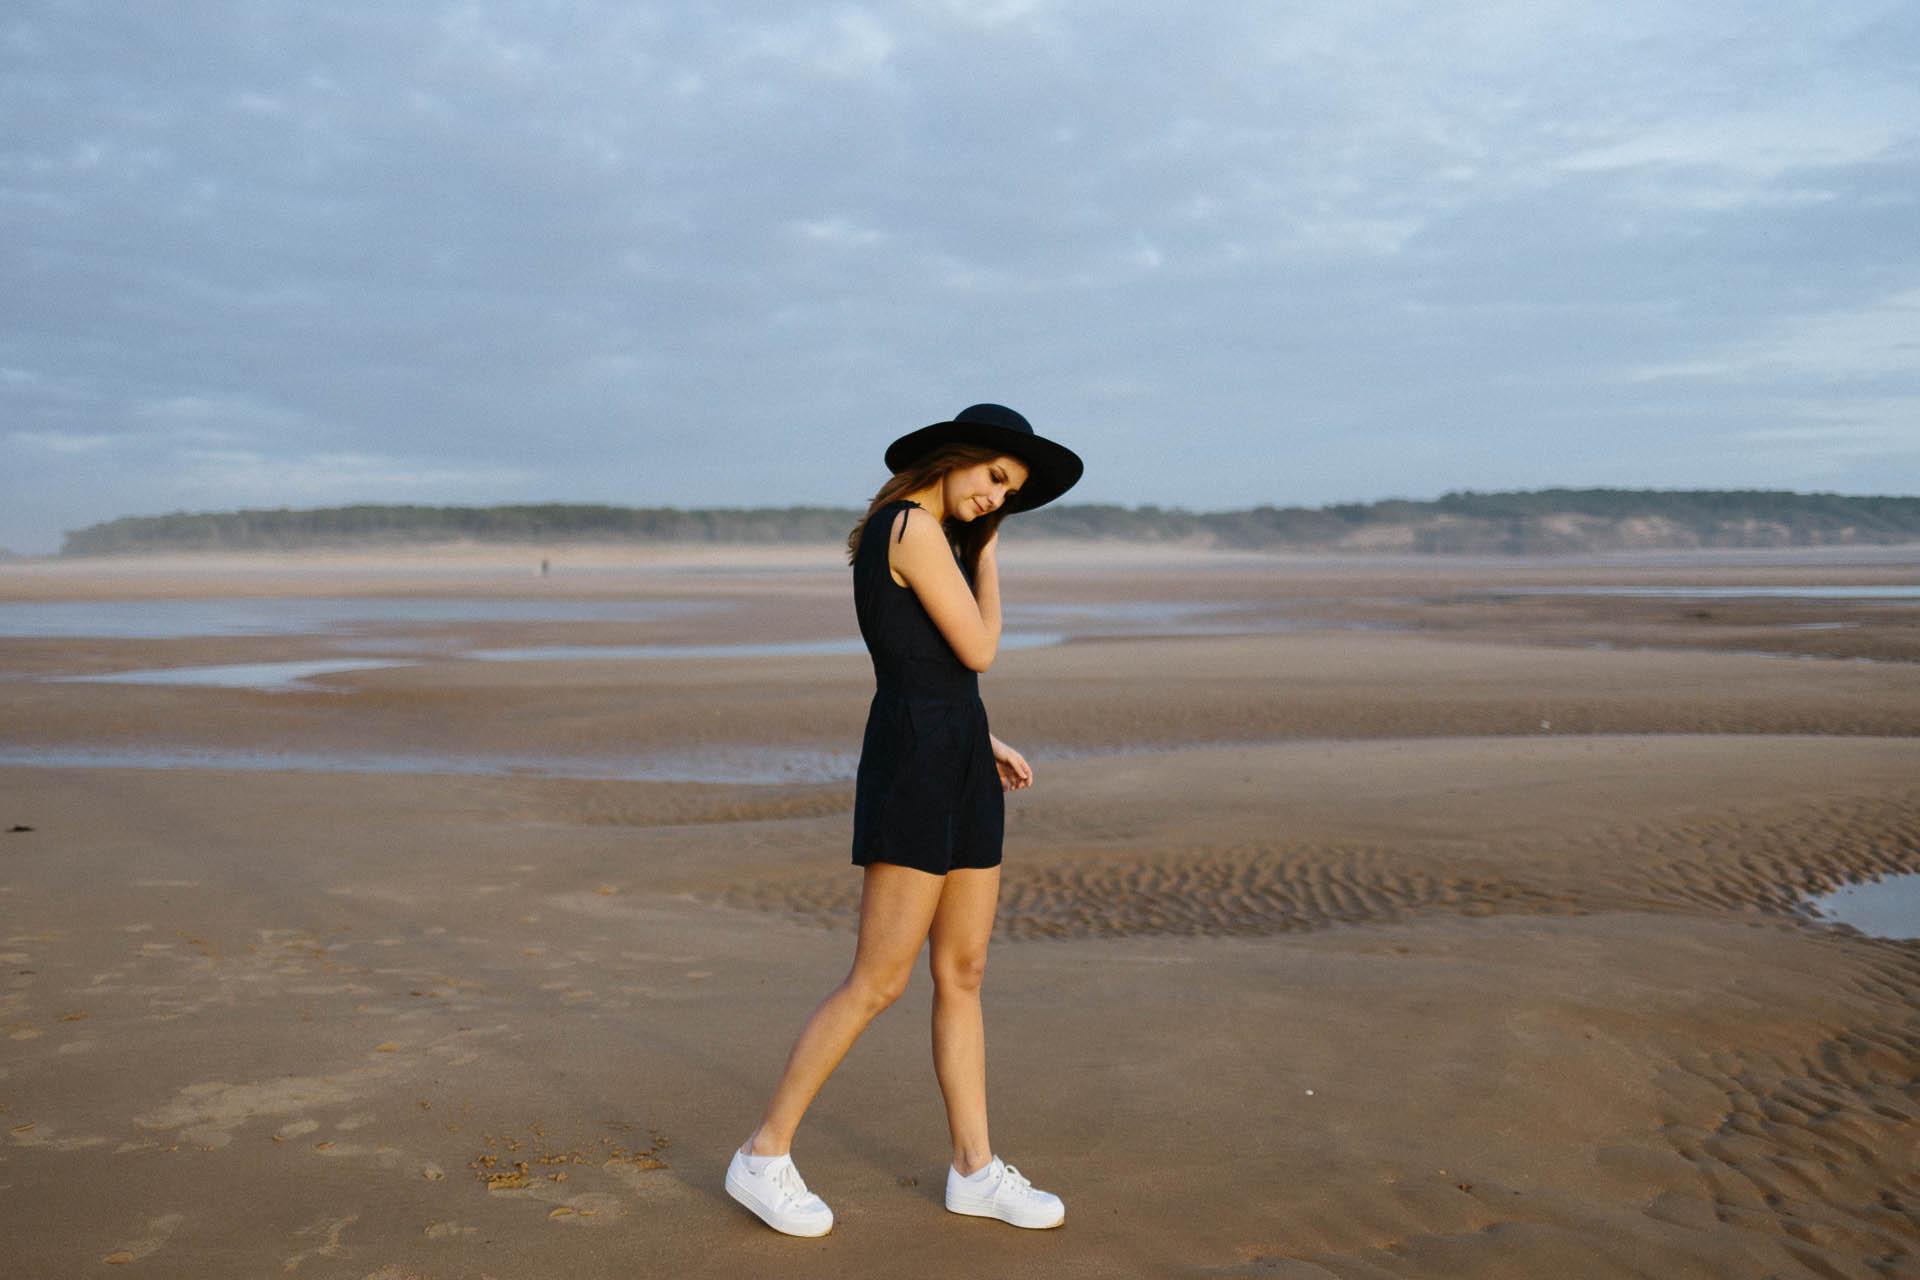 seance_portrait_marlene_vendee_flavie_nelly_paysage-73